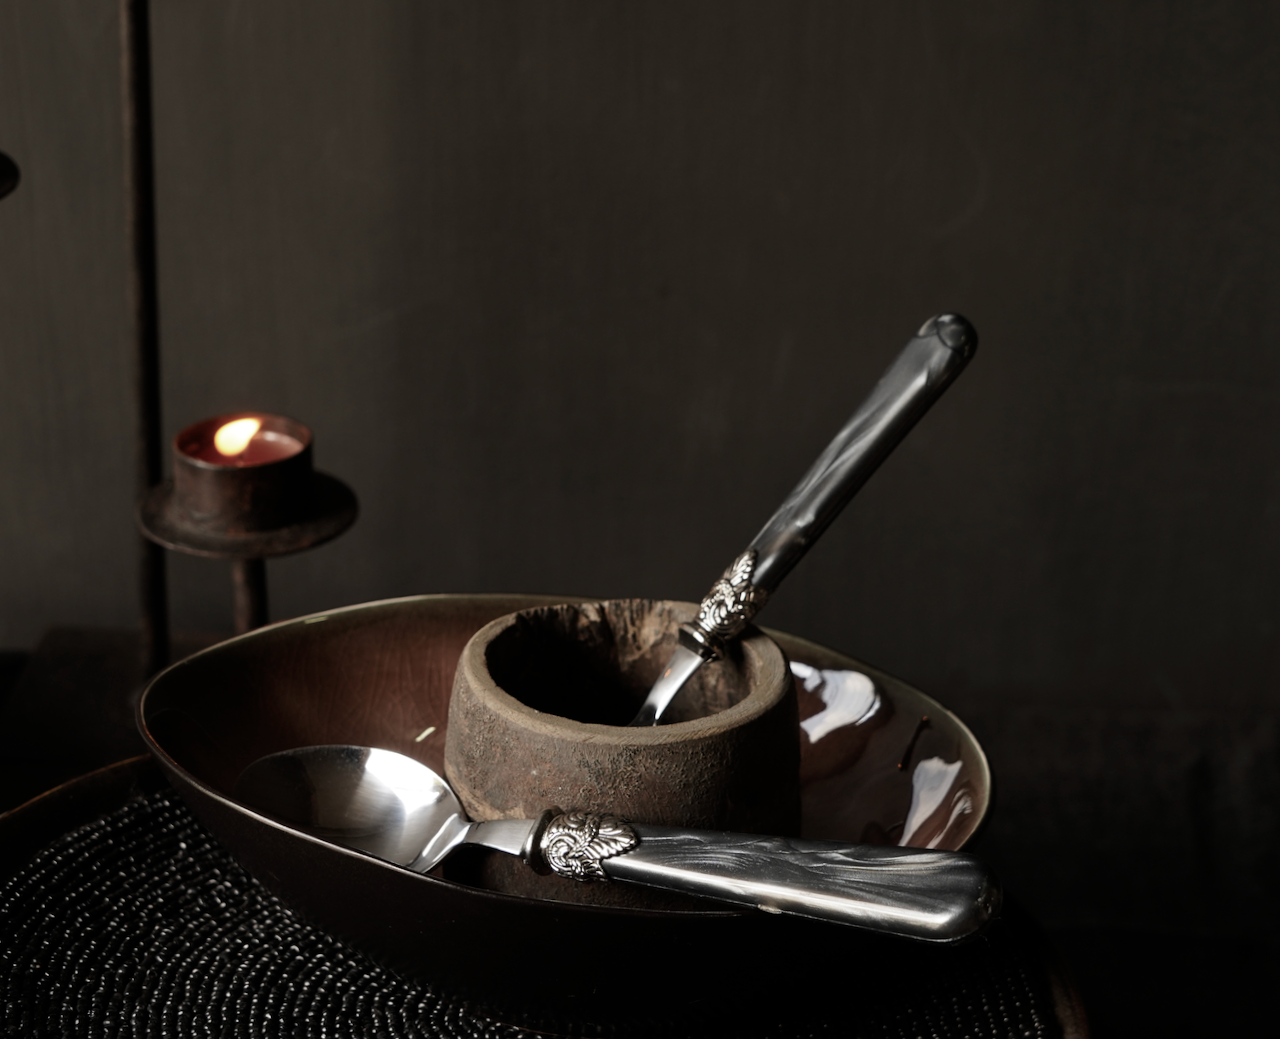 Cutlery 4-piece set vintage design-4